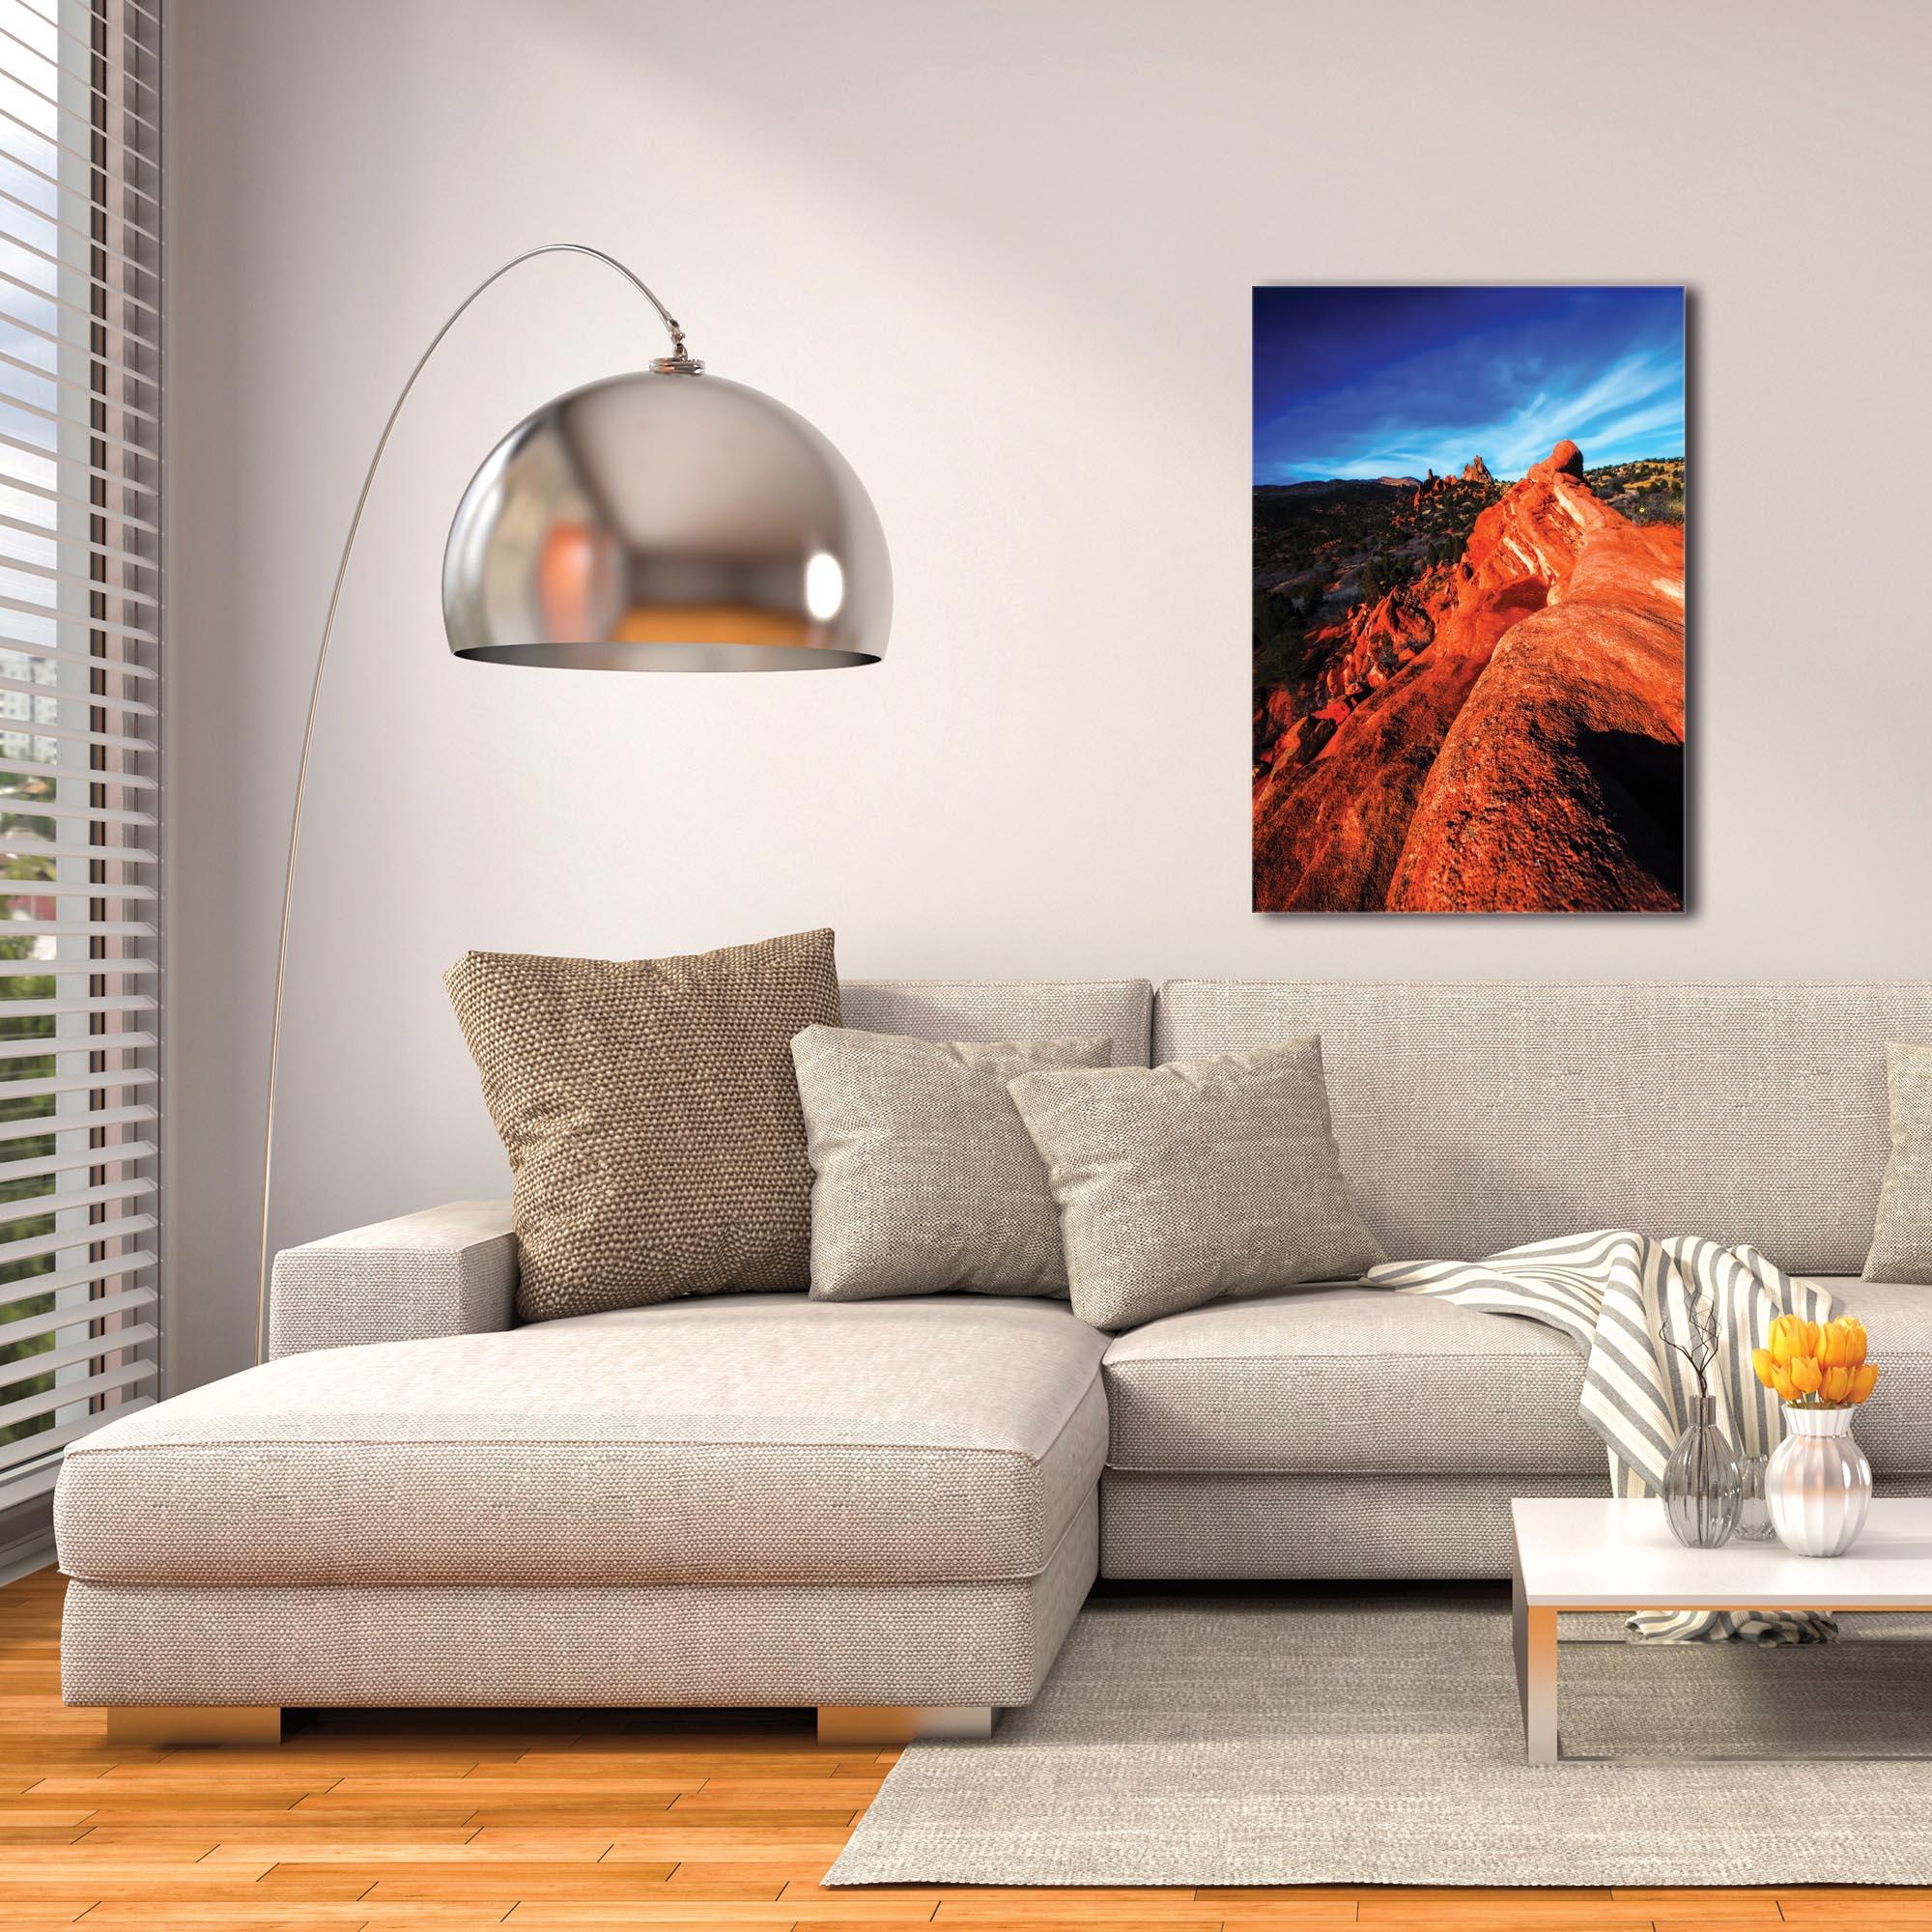 Landscape Photography 'Red Ridge' - Desert Scene Art on Metal or Plexiglass - Image 3